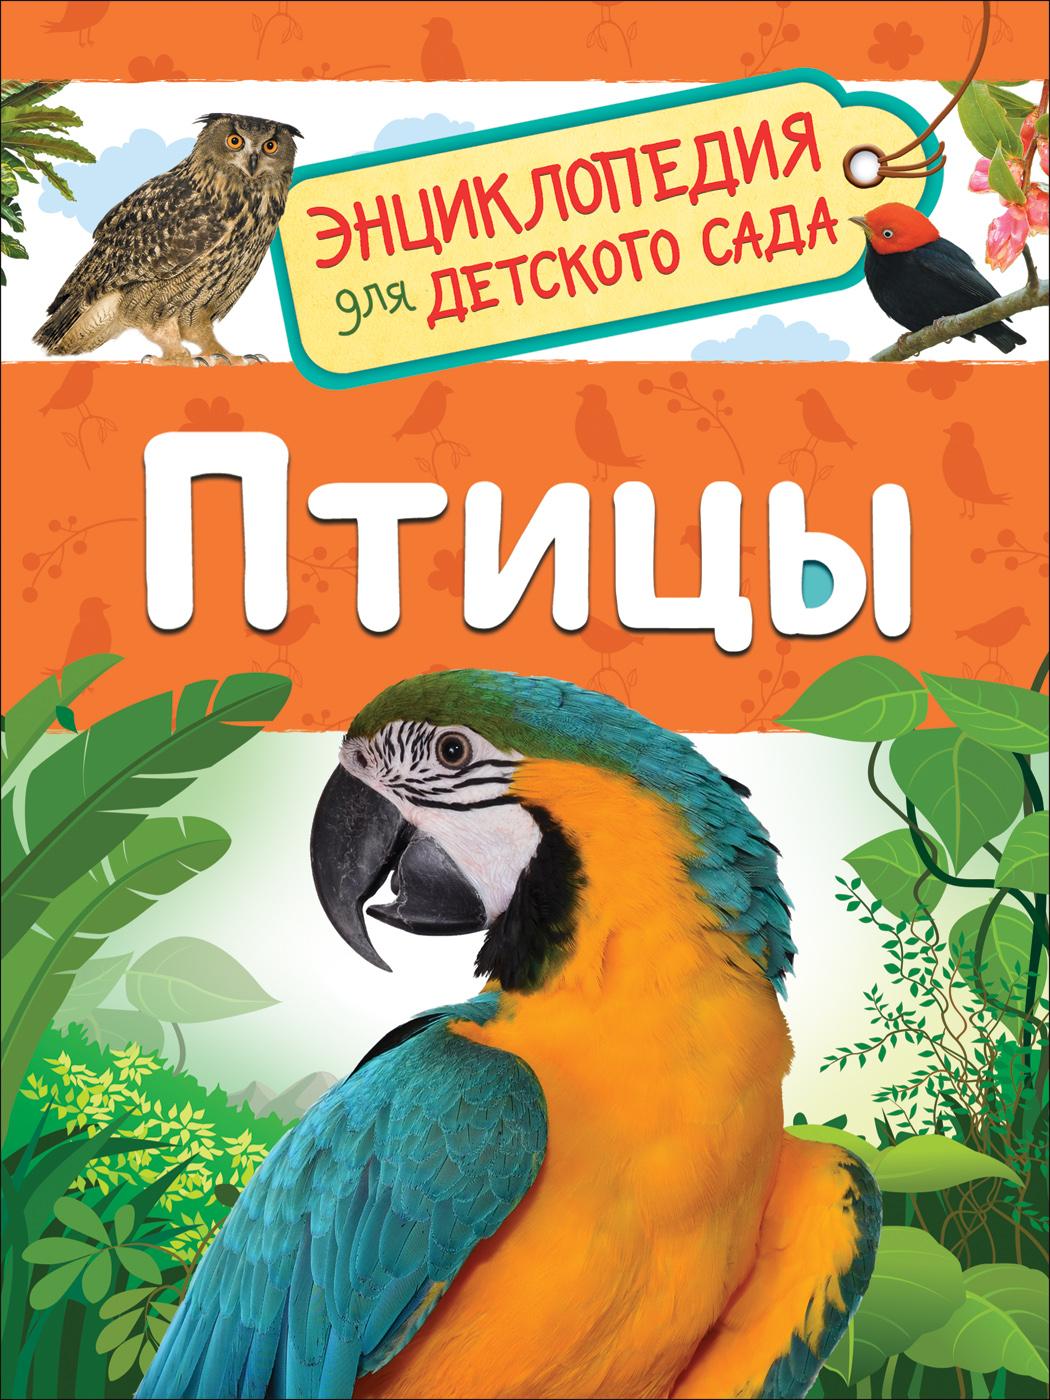 Galtseva S. N. Ptitsy (Entsiklopedija dlja detskogo sada)